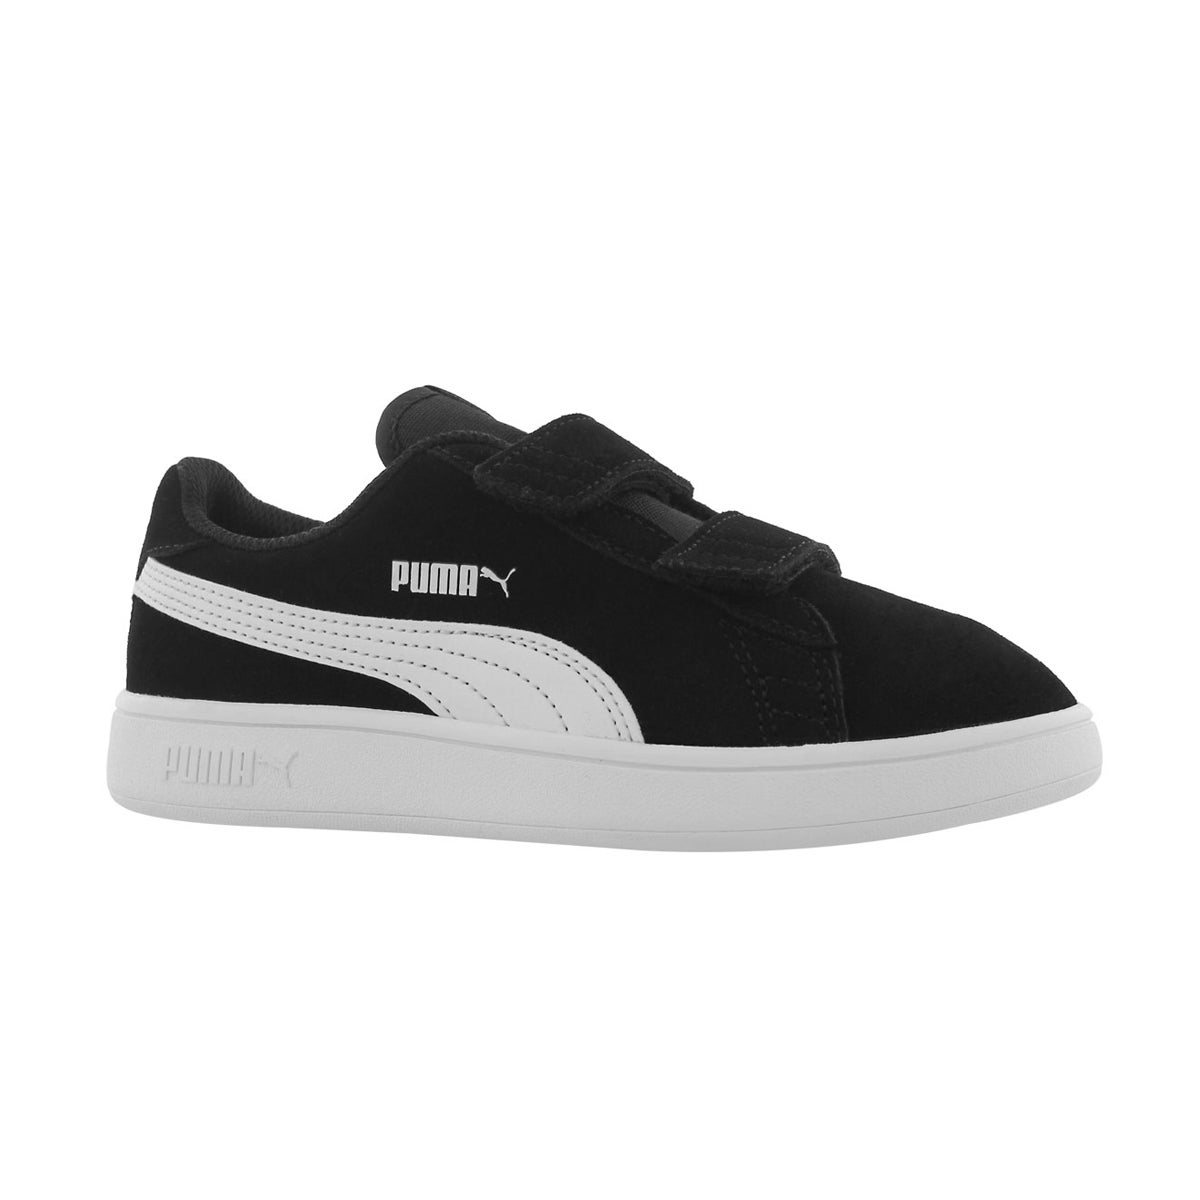 Boys' PUMA SMASH V2 black sneakers